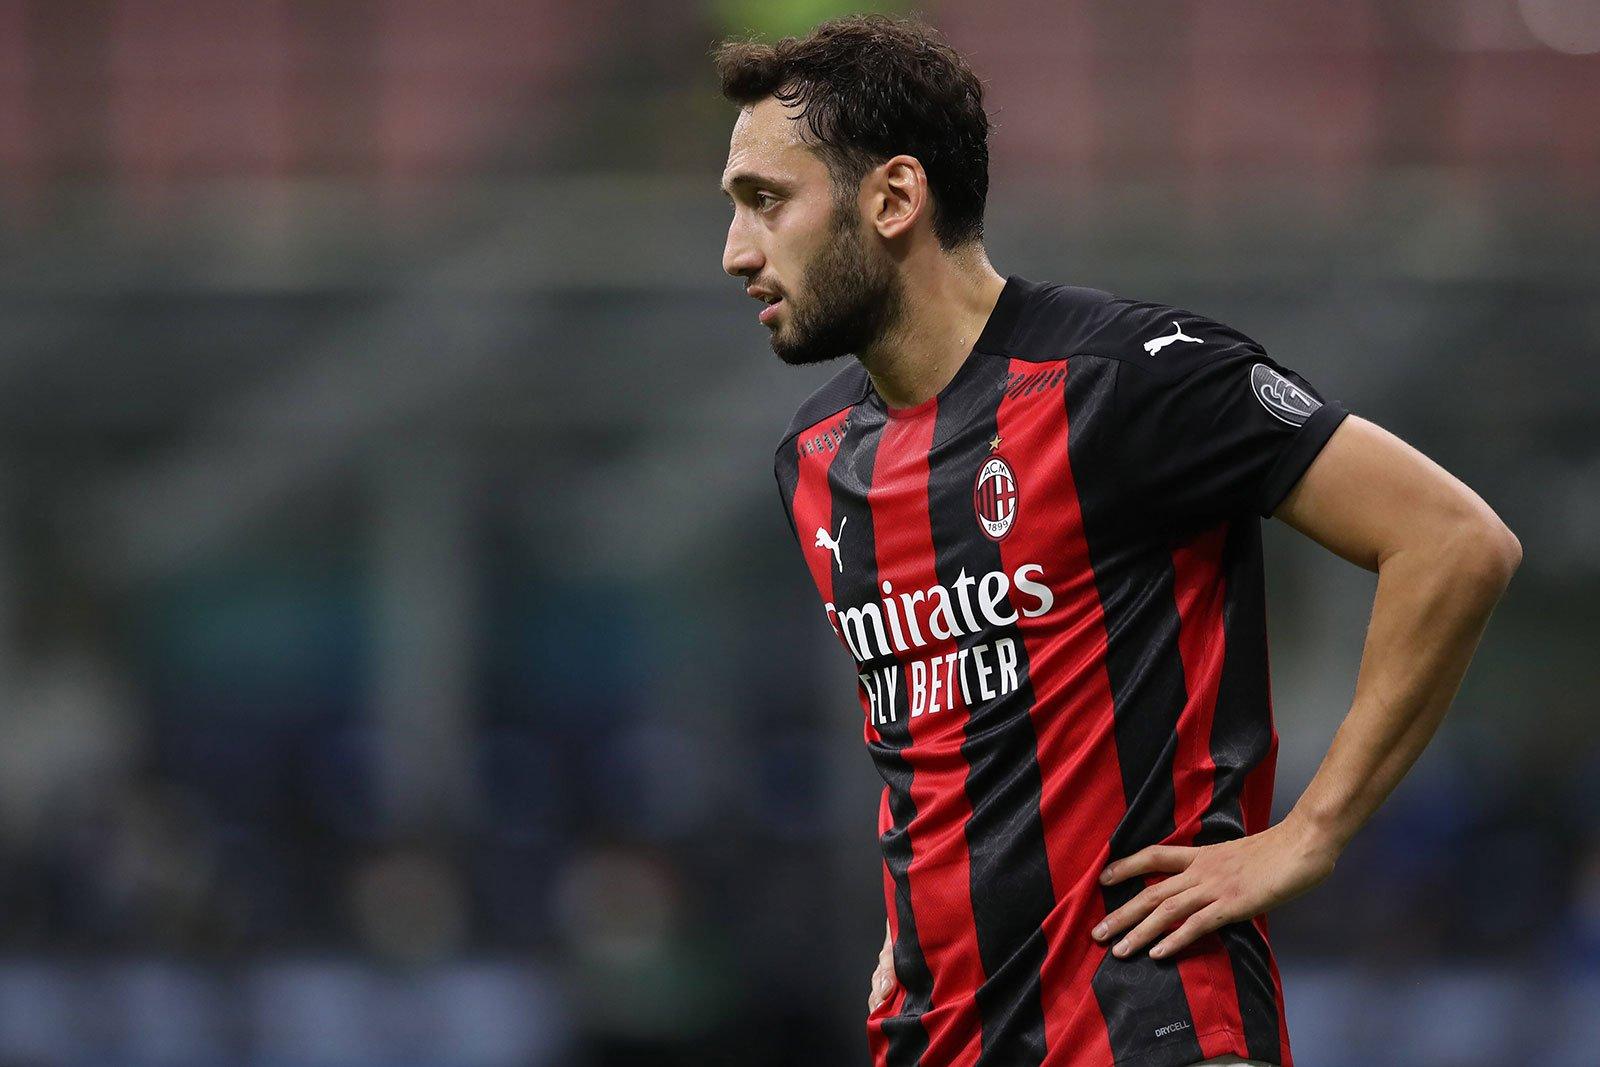 Çalhanoğlu suffered ankle injury in training, left Milanello on ...